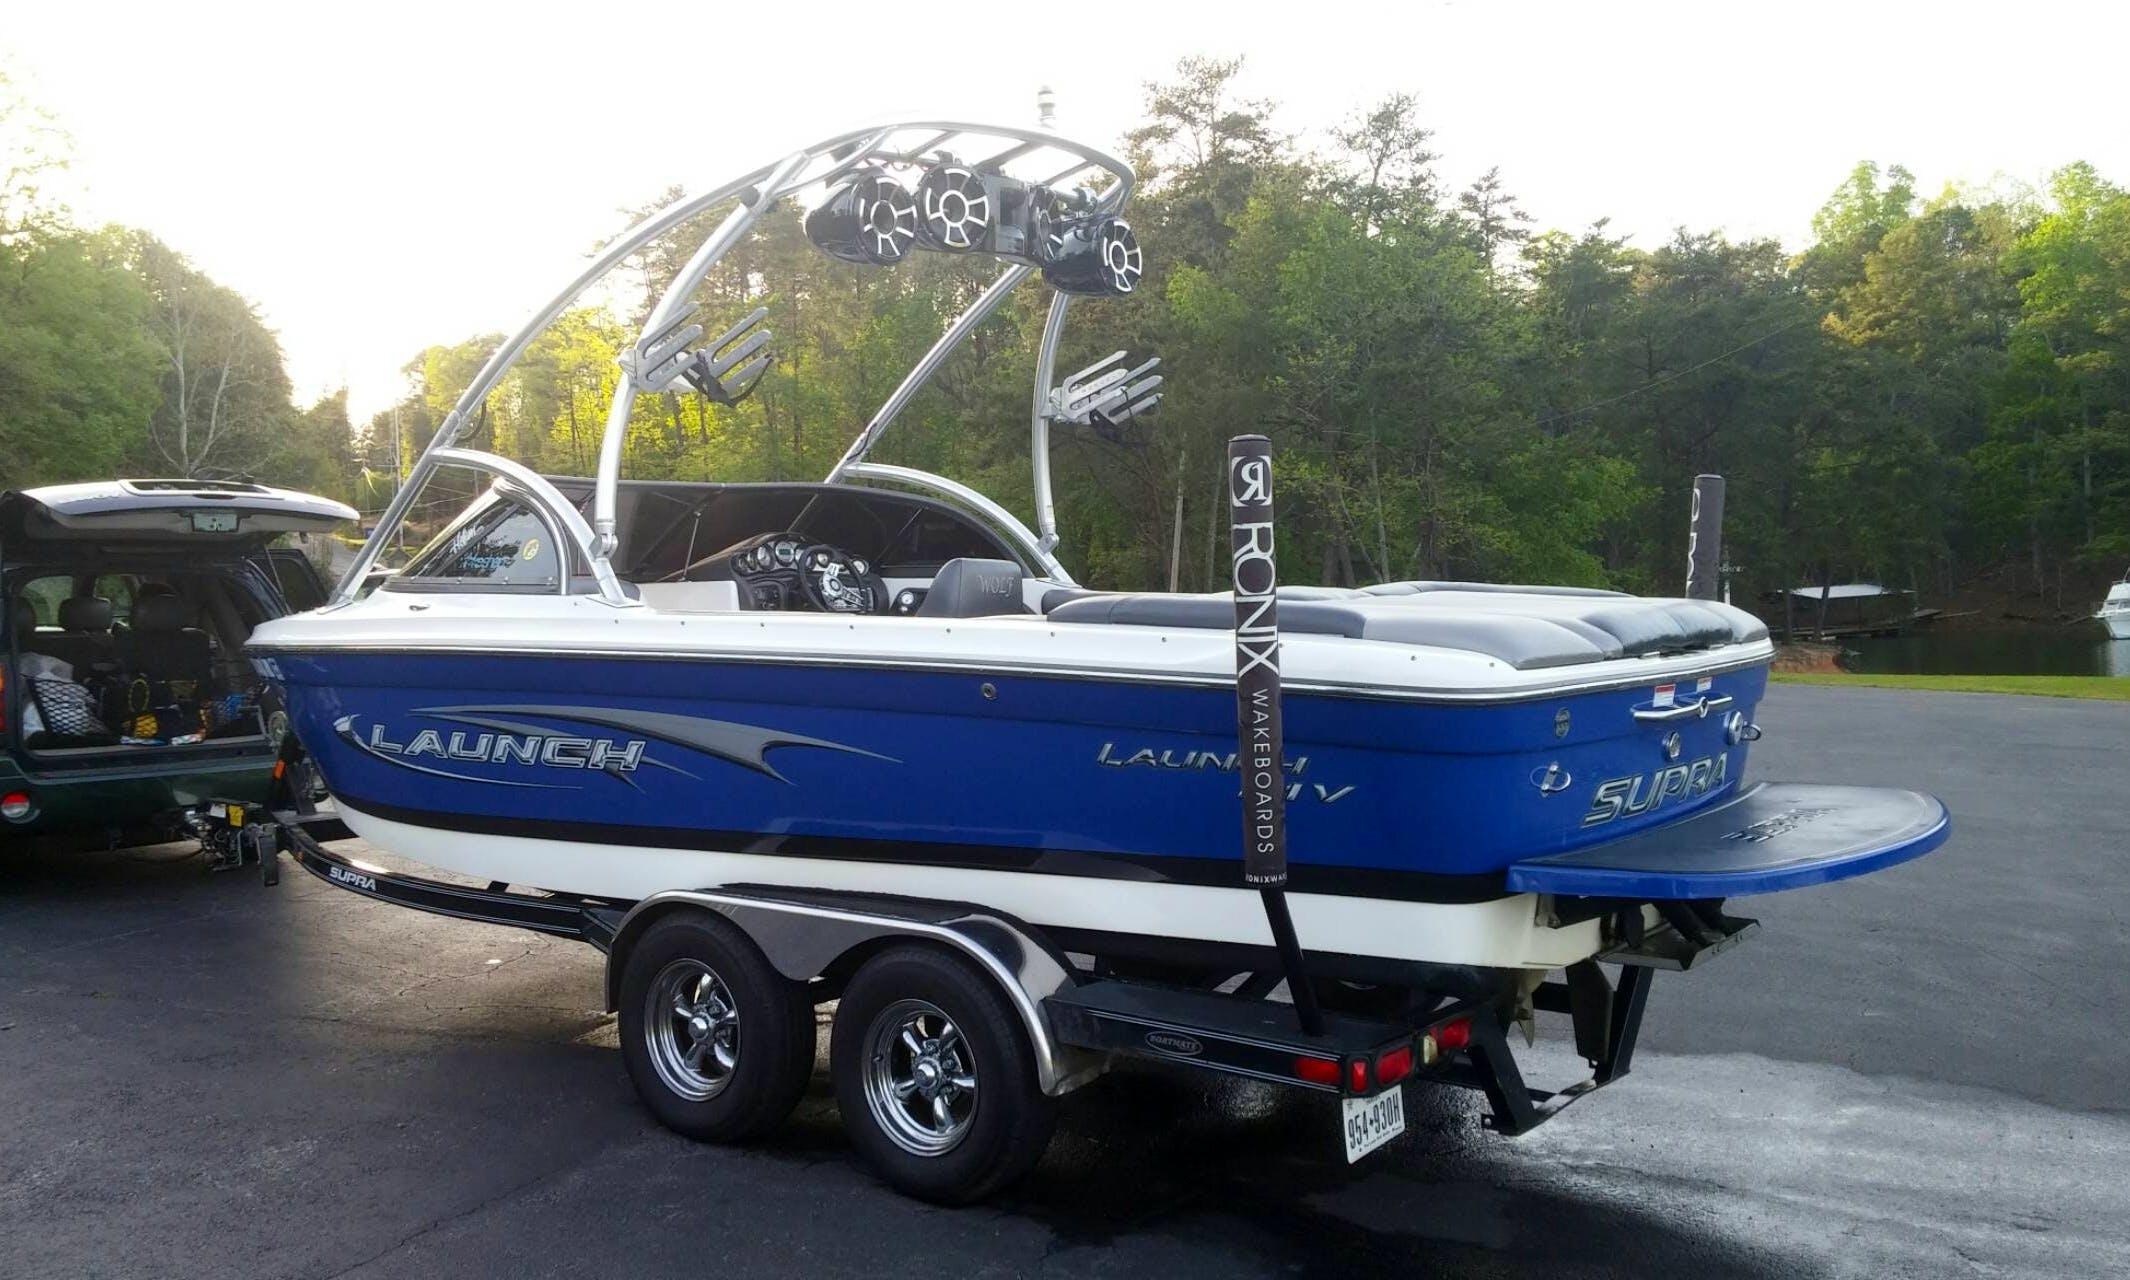 22' Supra Launch Bowrider Rental In Cumming, Georgia